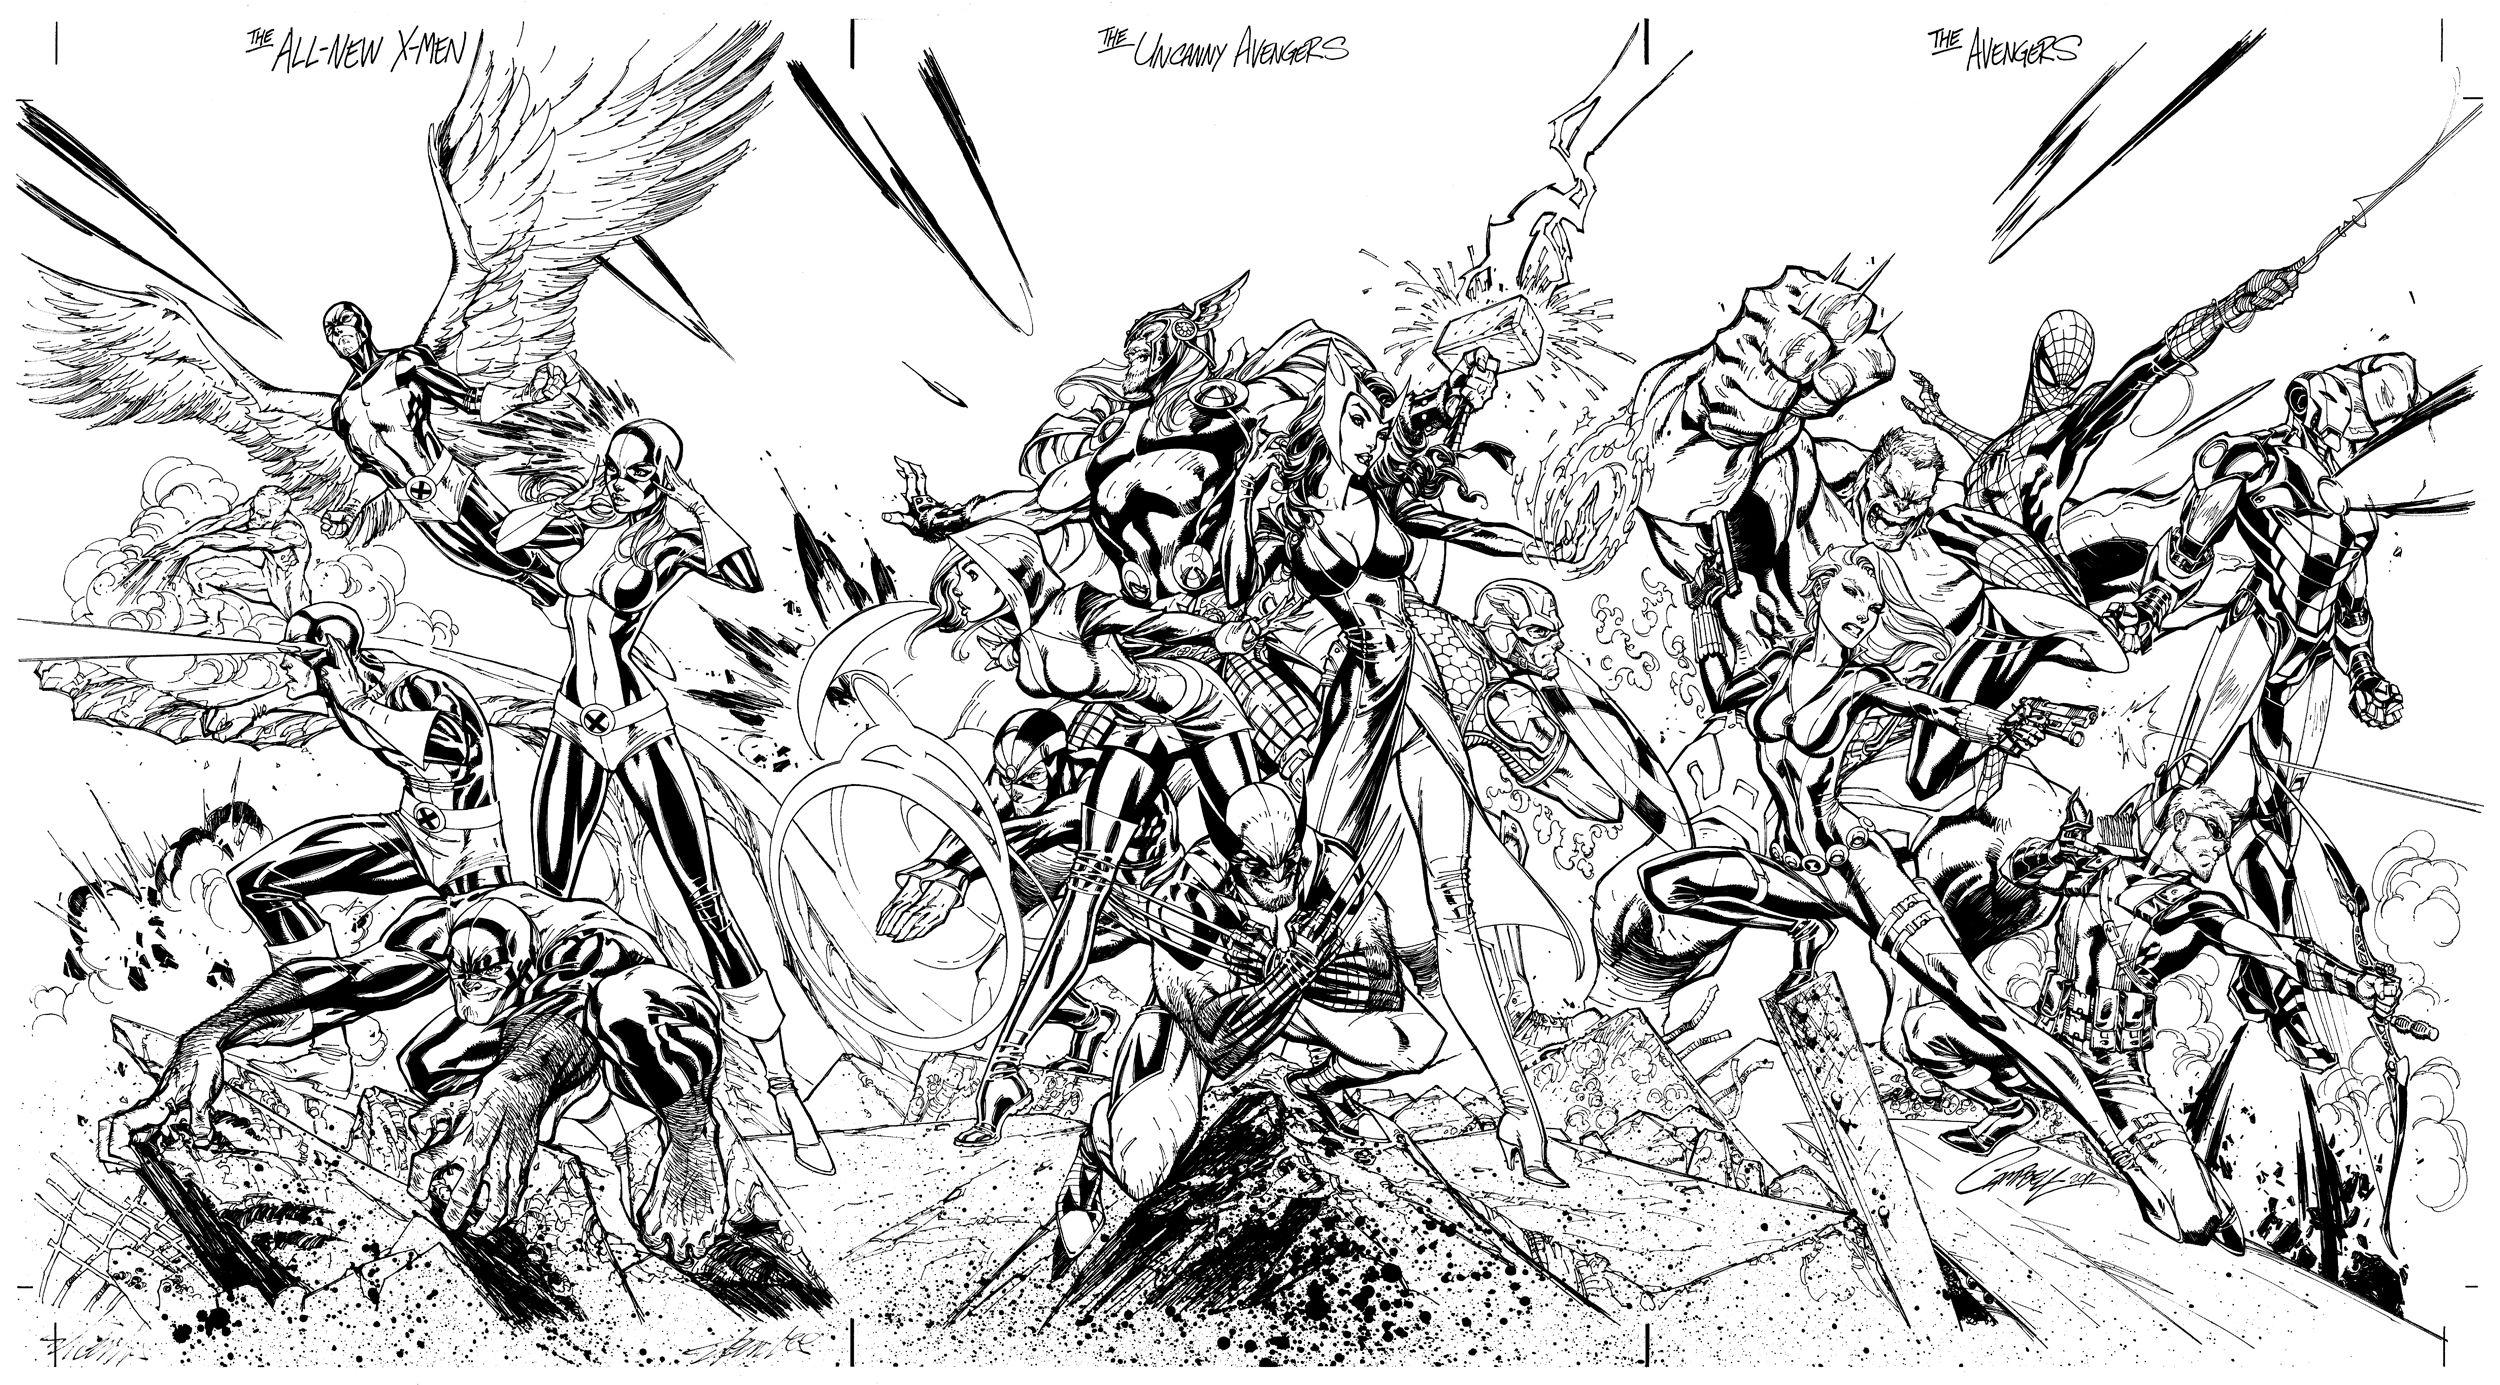 X Men Avengers Campbell Avengers Coloring Pages Avengers Coloring Coloring Pages